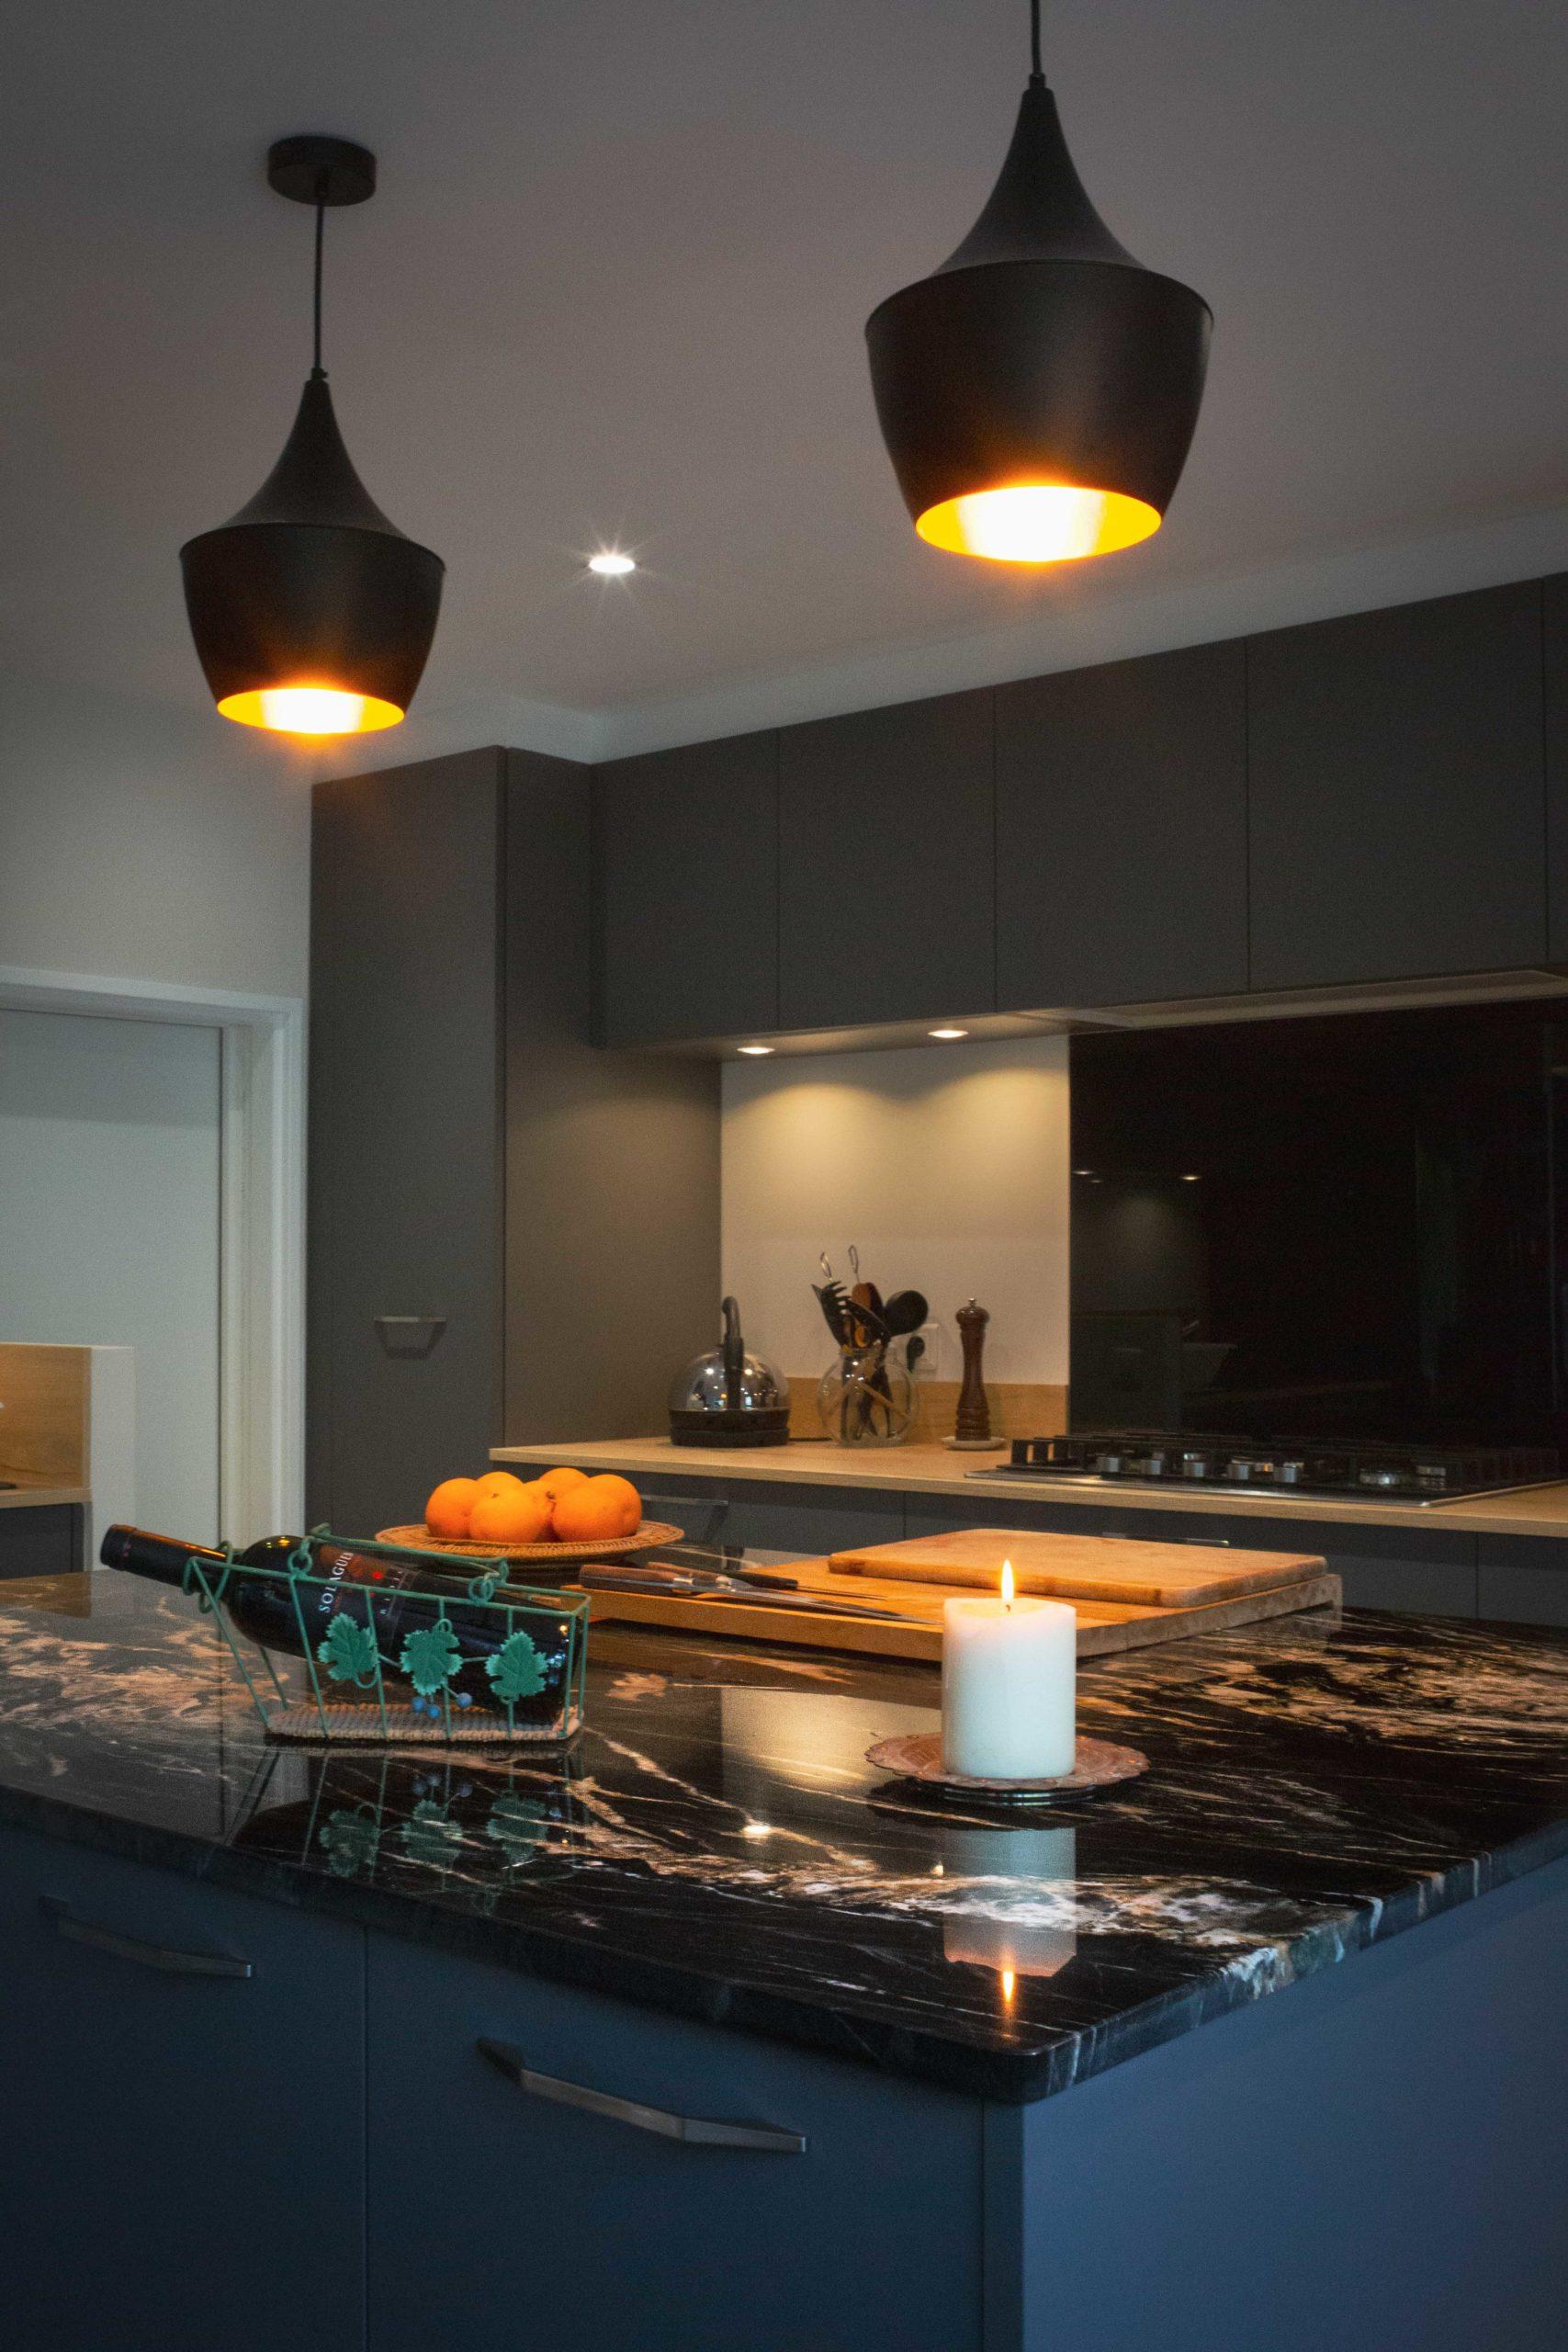 mh-deco-taverny-cuisine-granit-noir